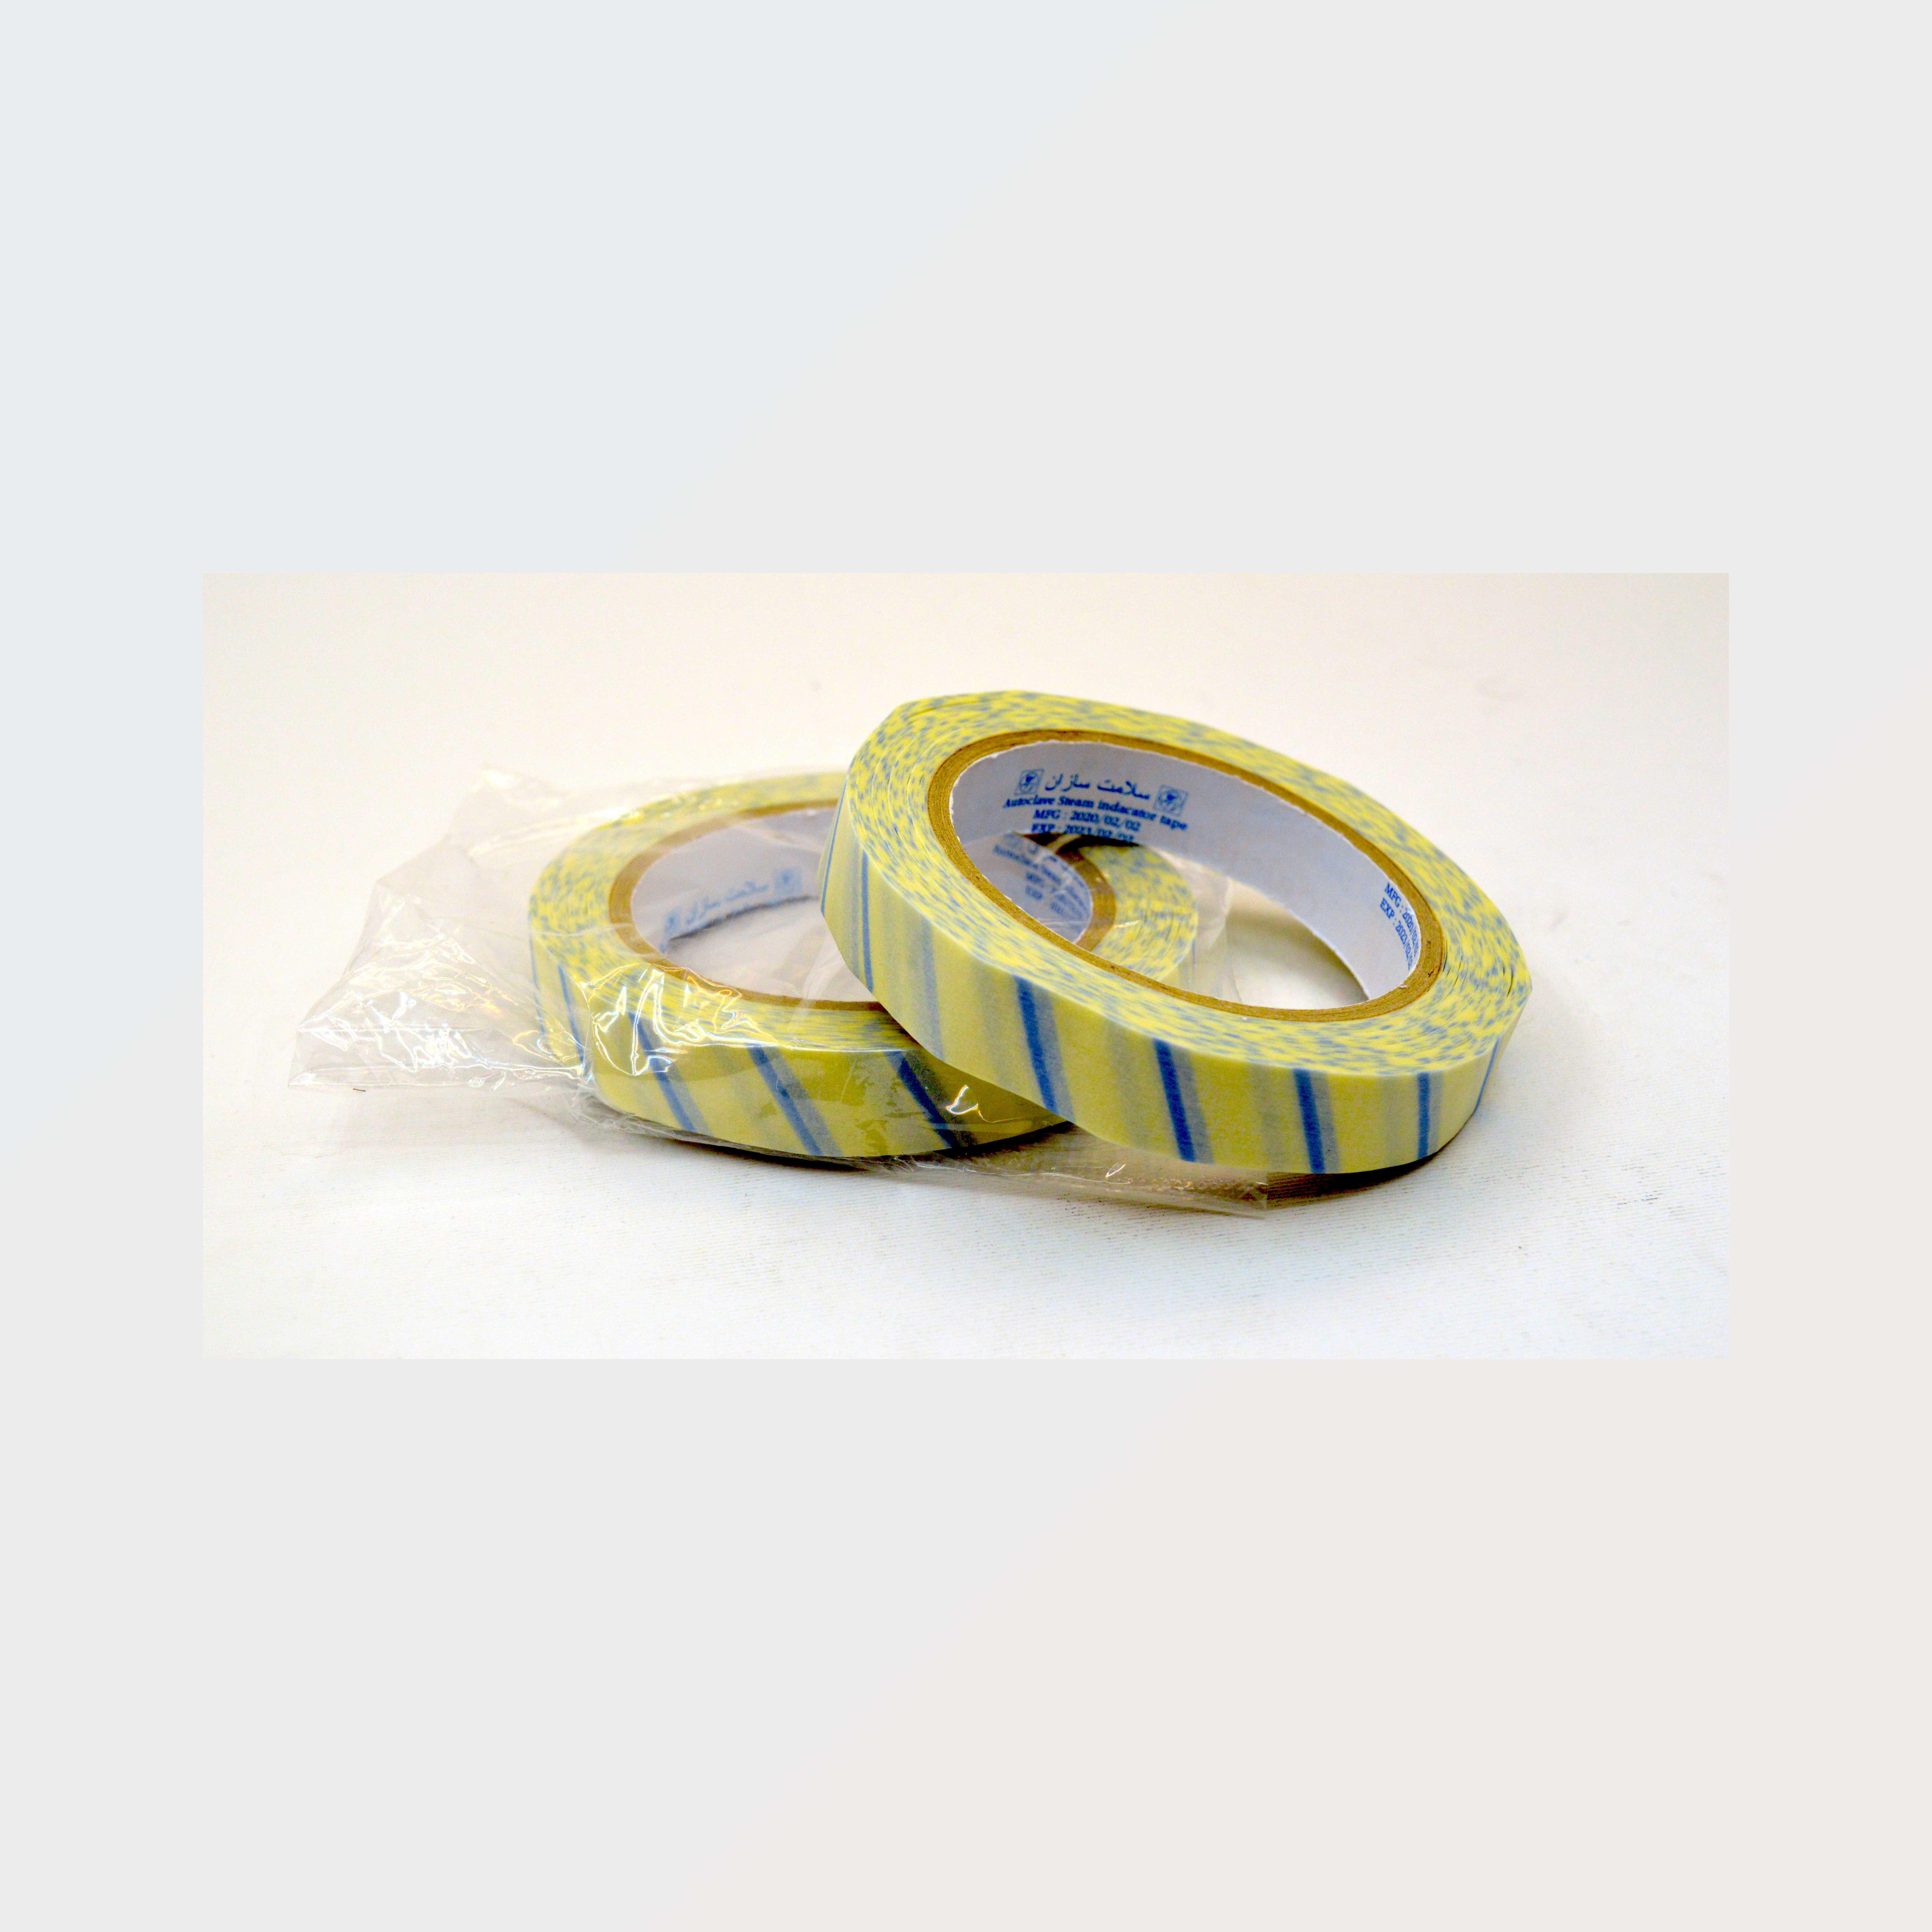 چسب اتو کلاو یا نوار اتو کلاو - Autoclave Tape در سپدنت